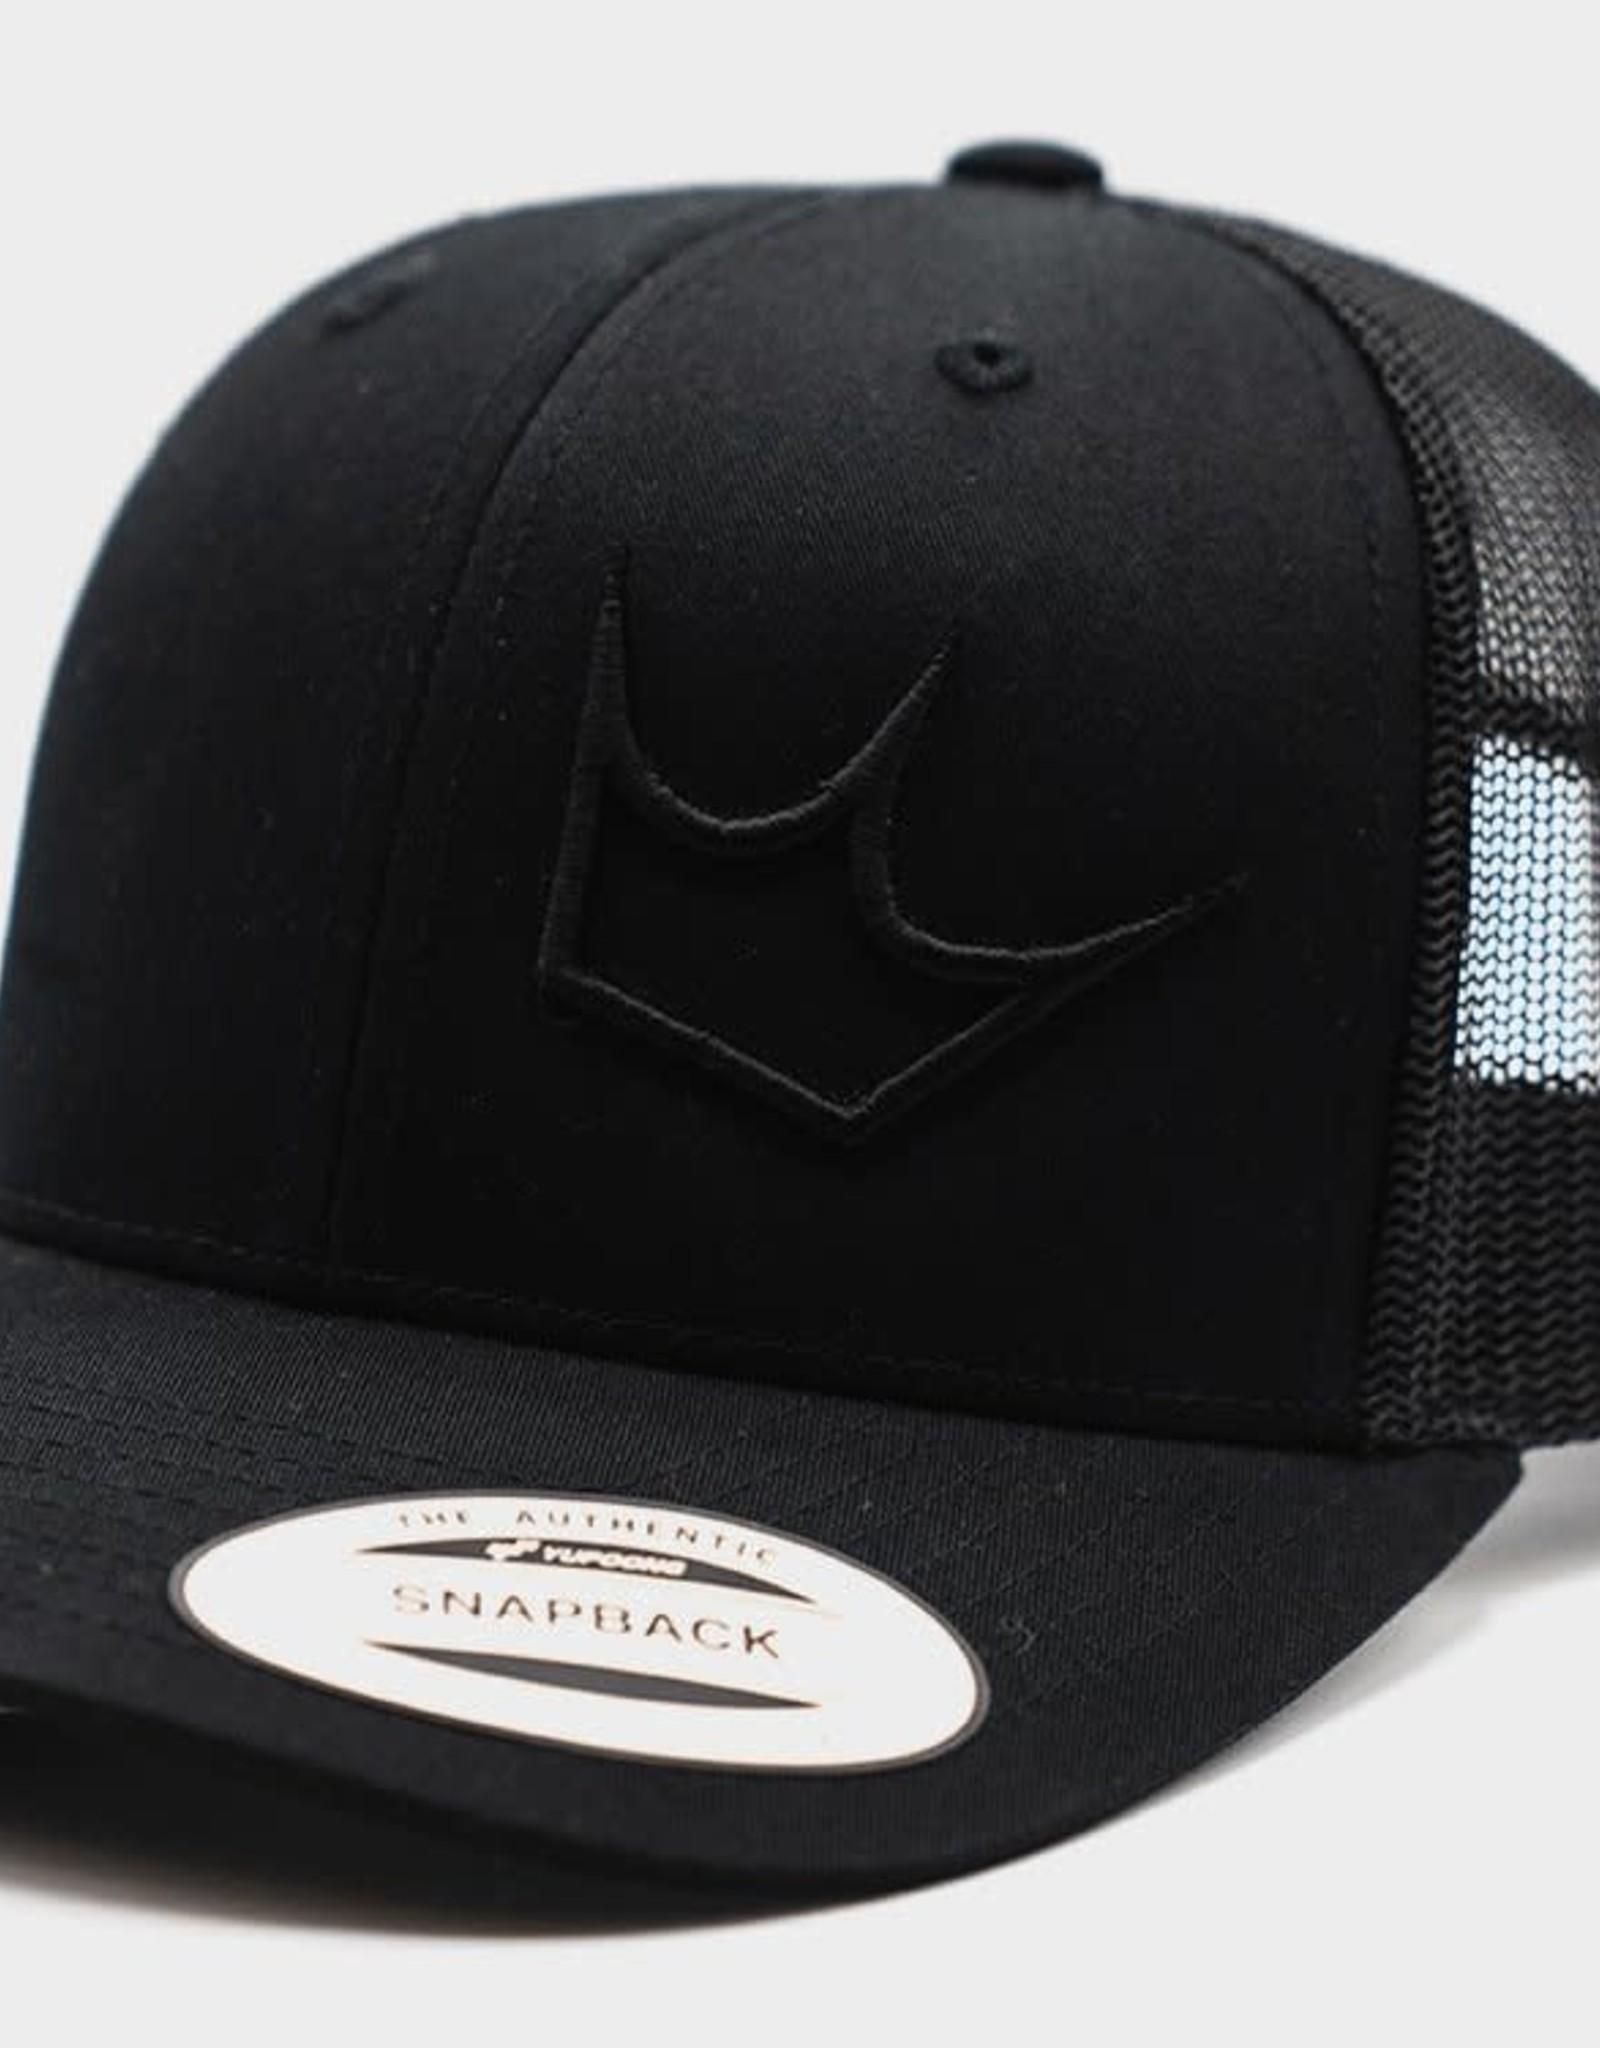 Peaty's CAP PUB WEAR